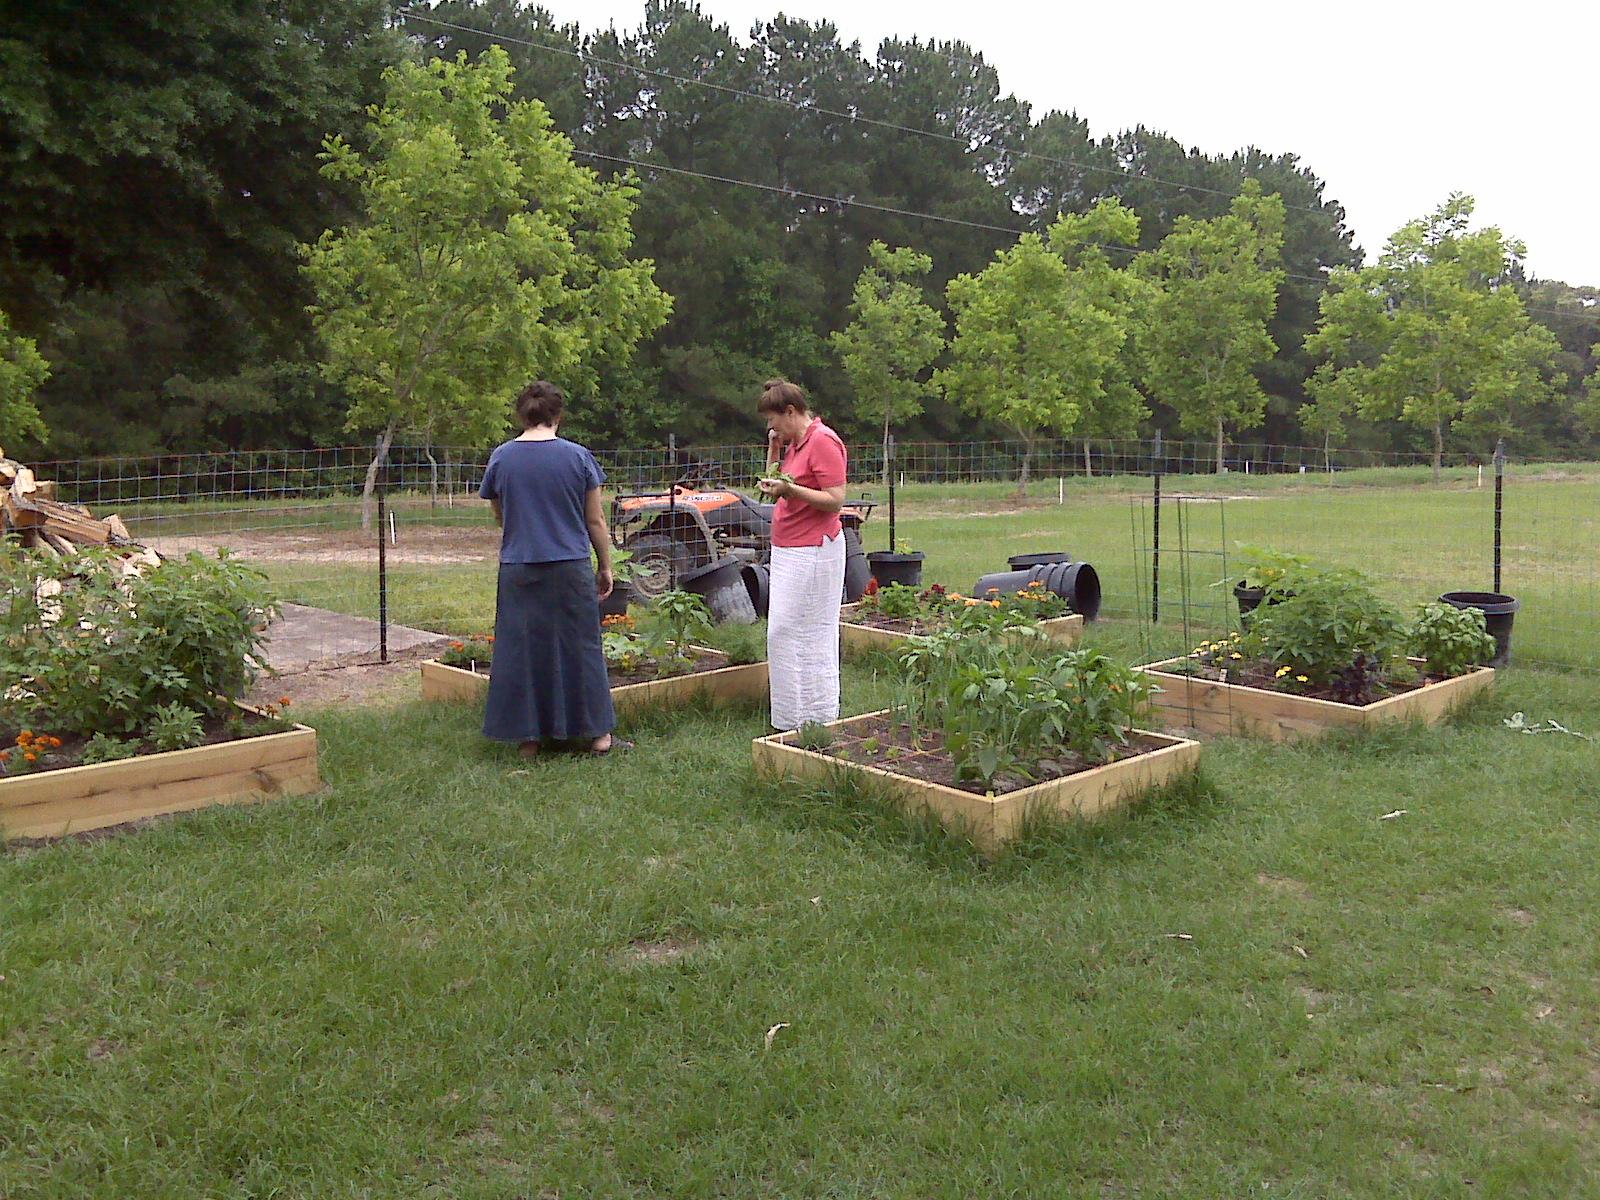 Kim and Kathy gardening